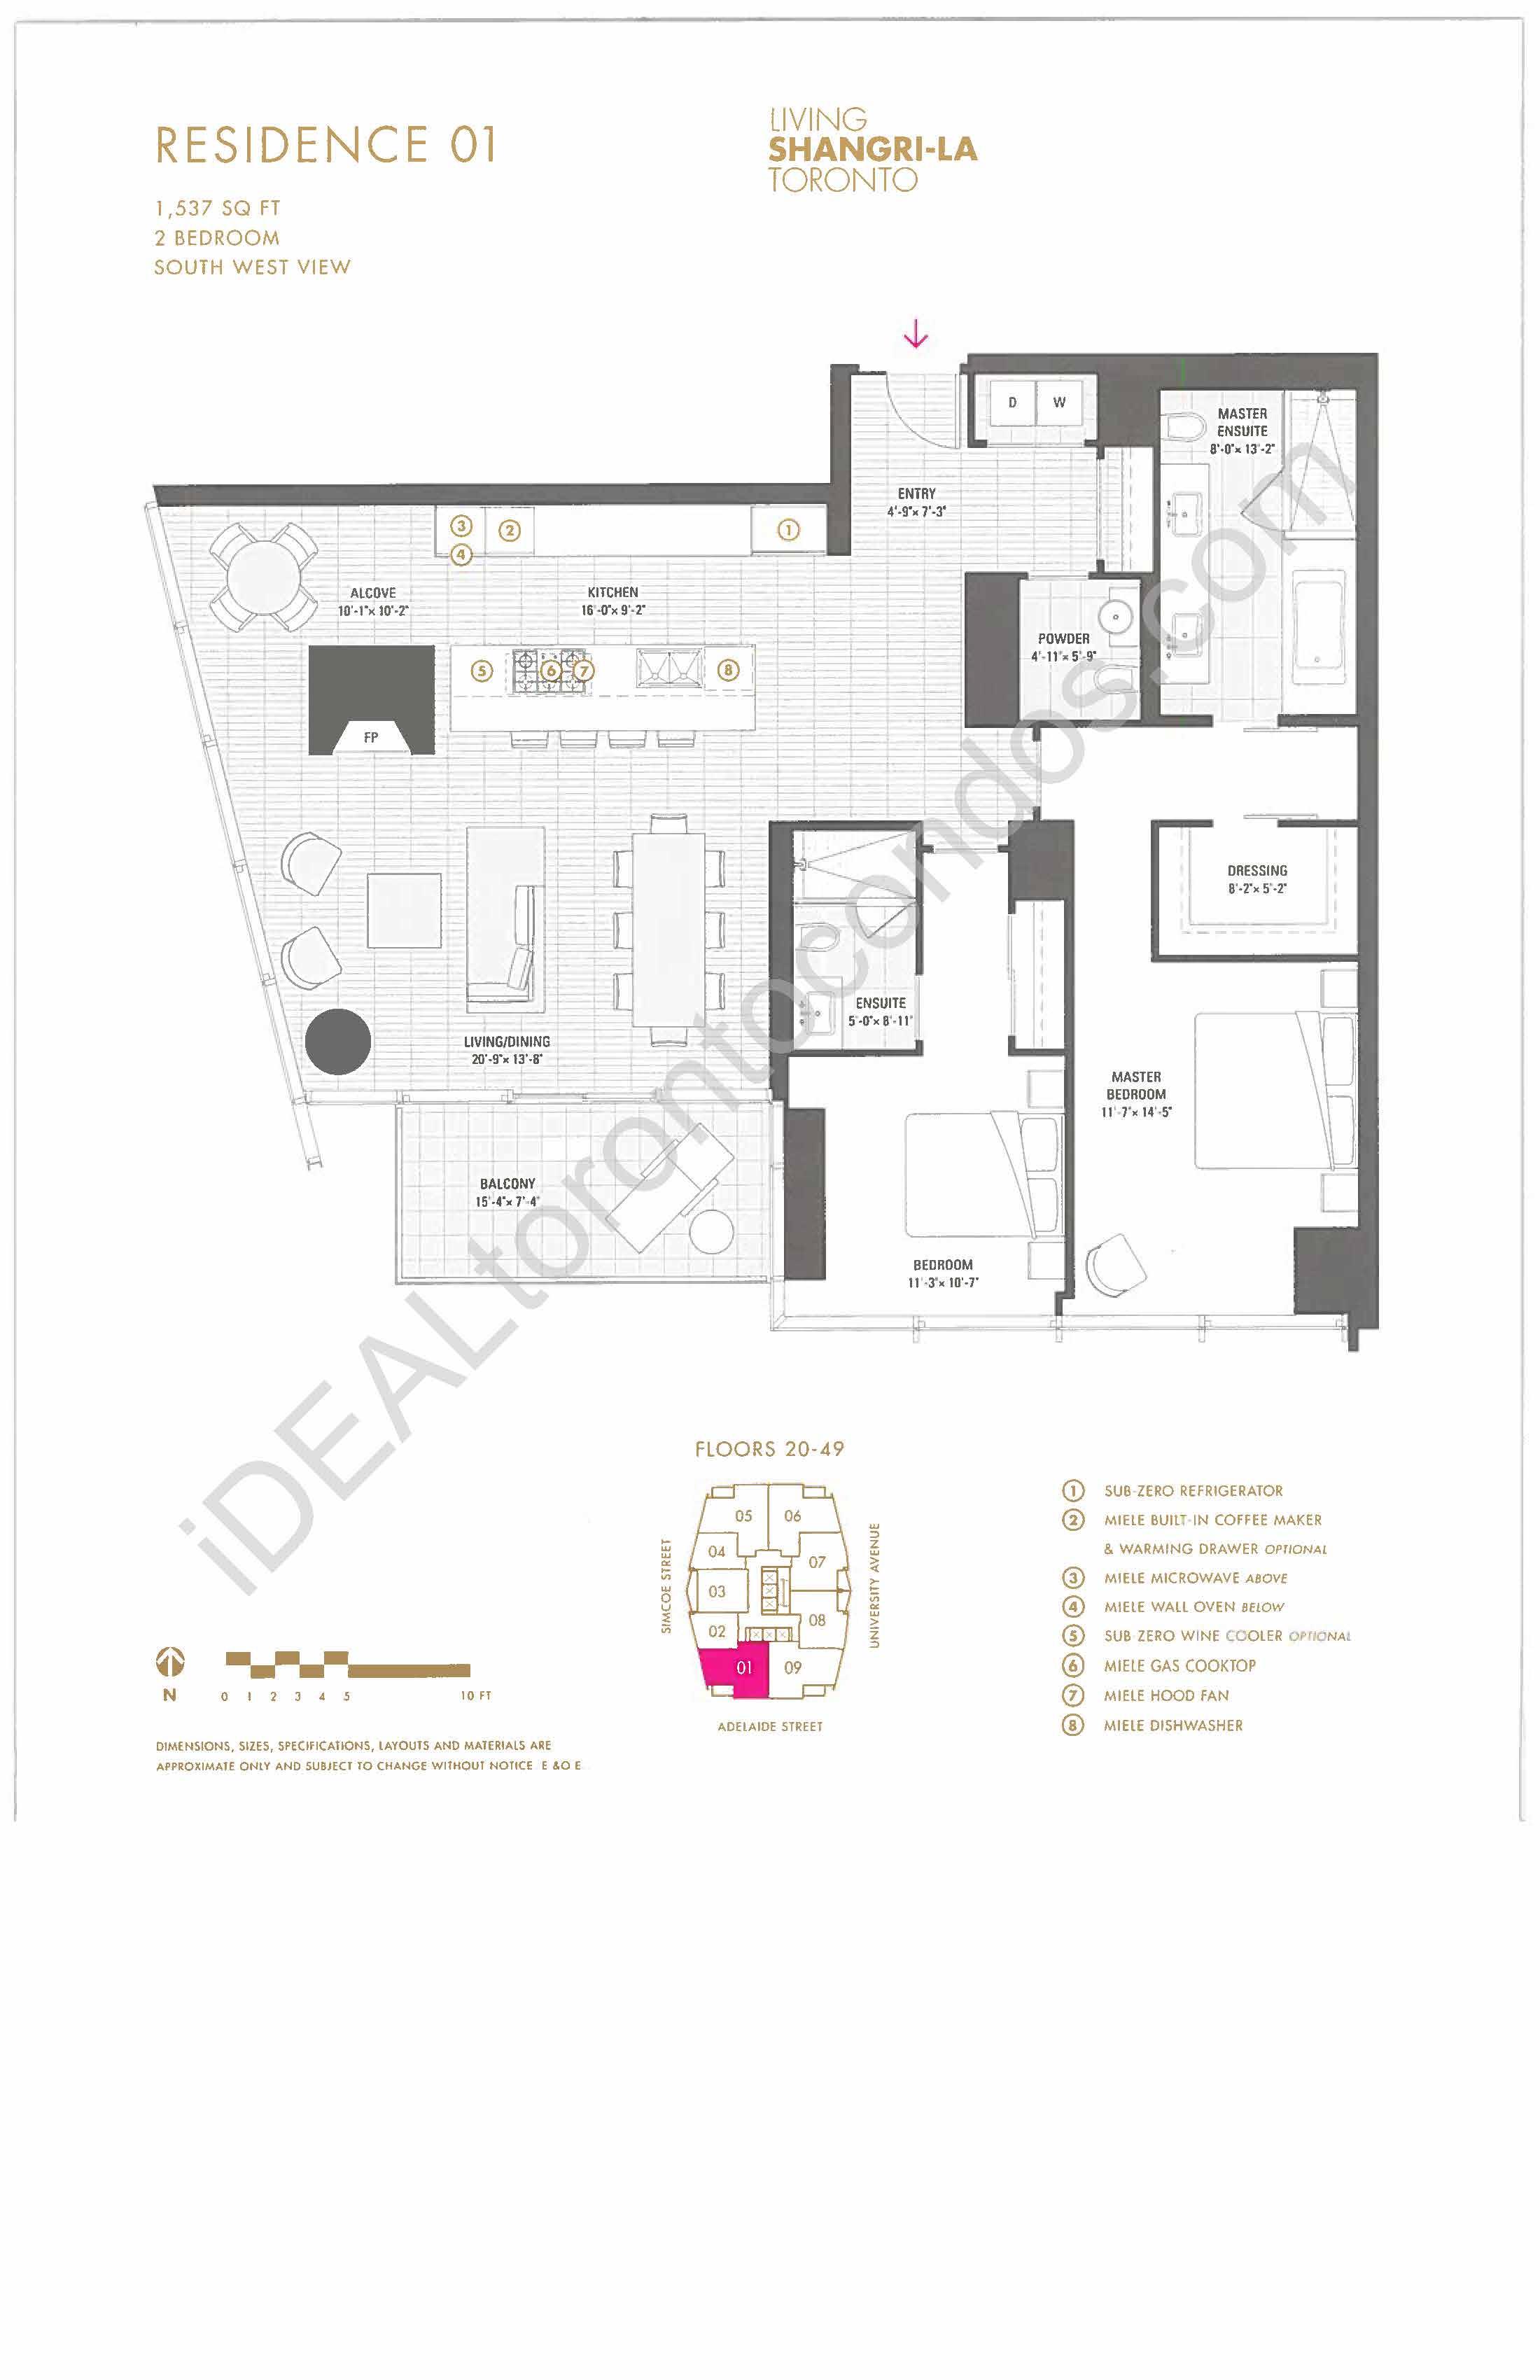 Residence 01 - 2 Bedroom